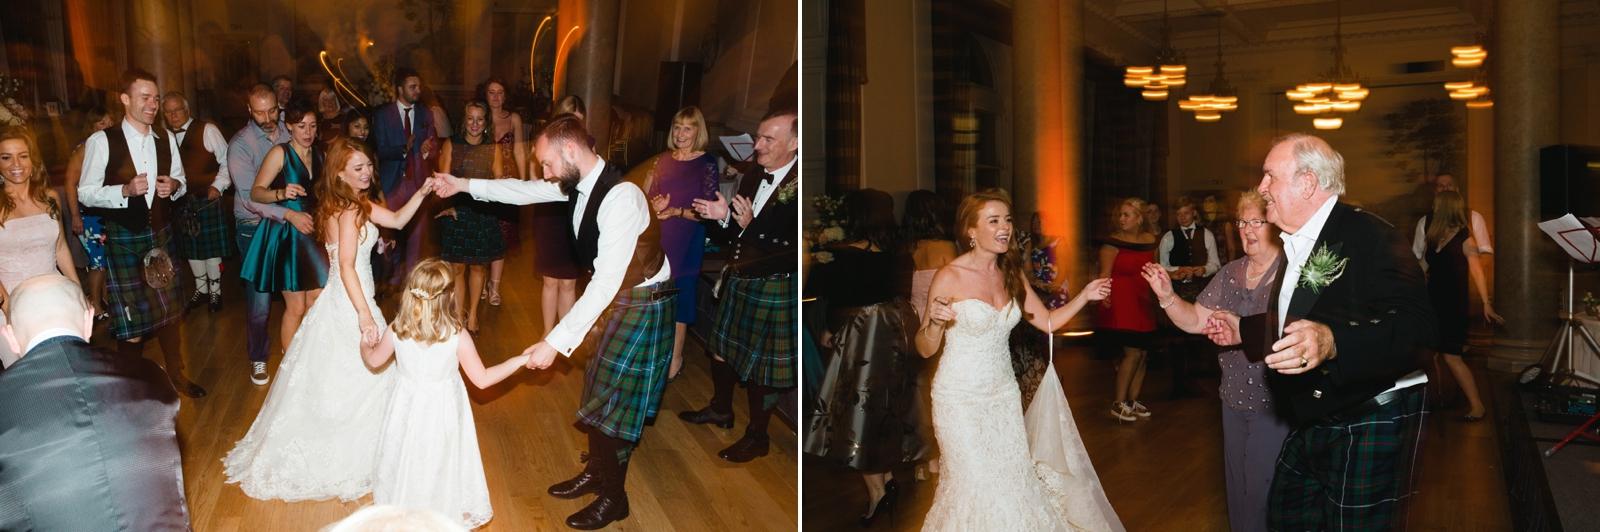 weddingthebalmoralsp8-11.jpg